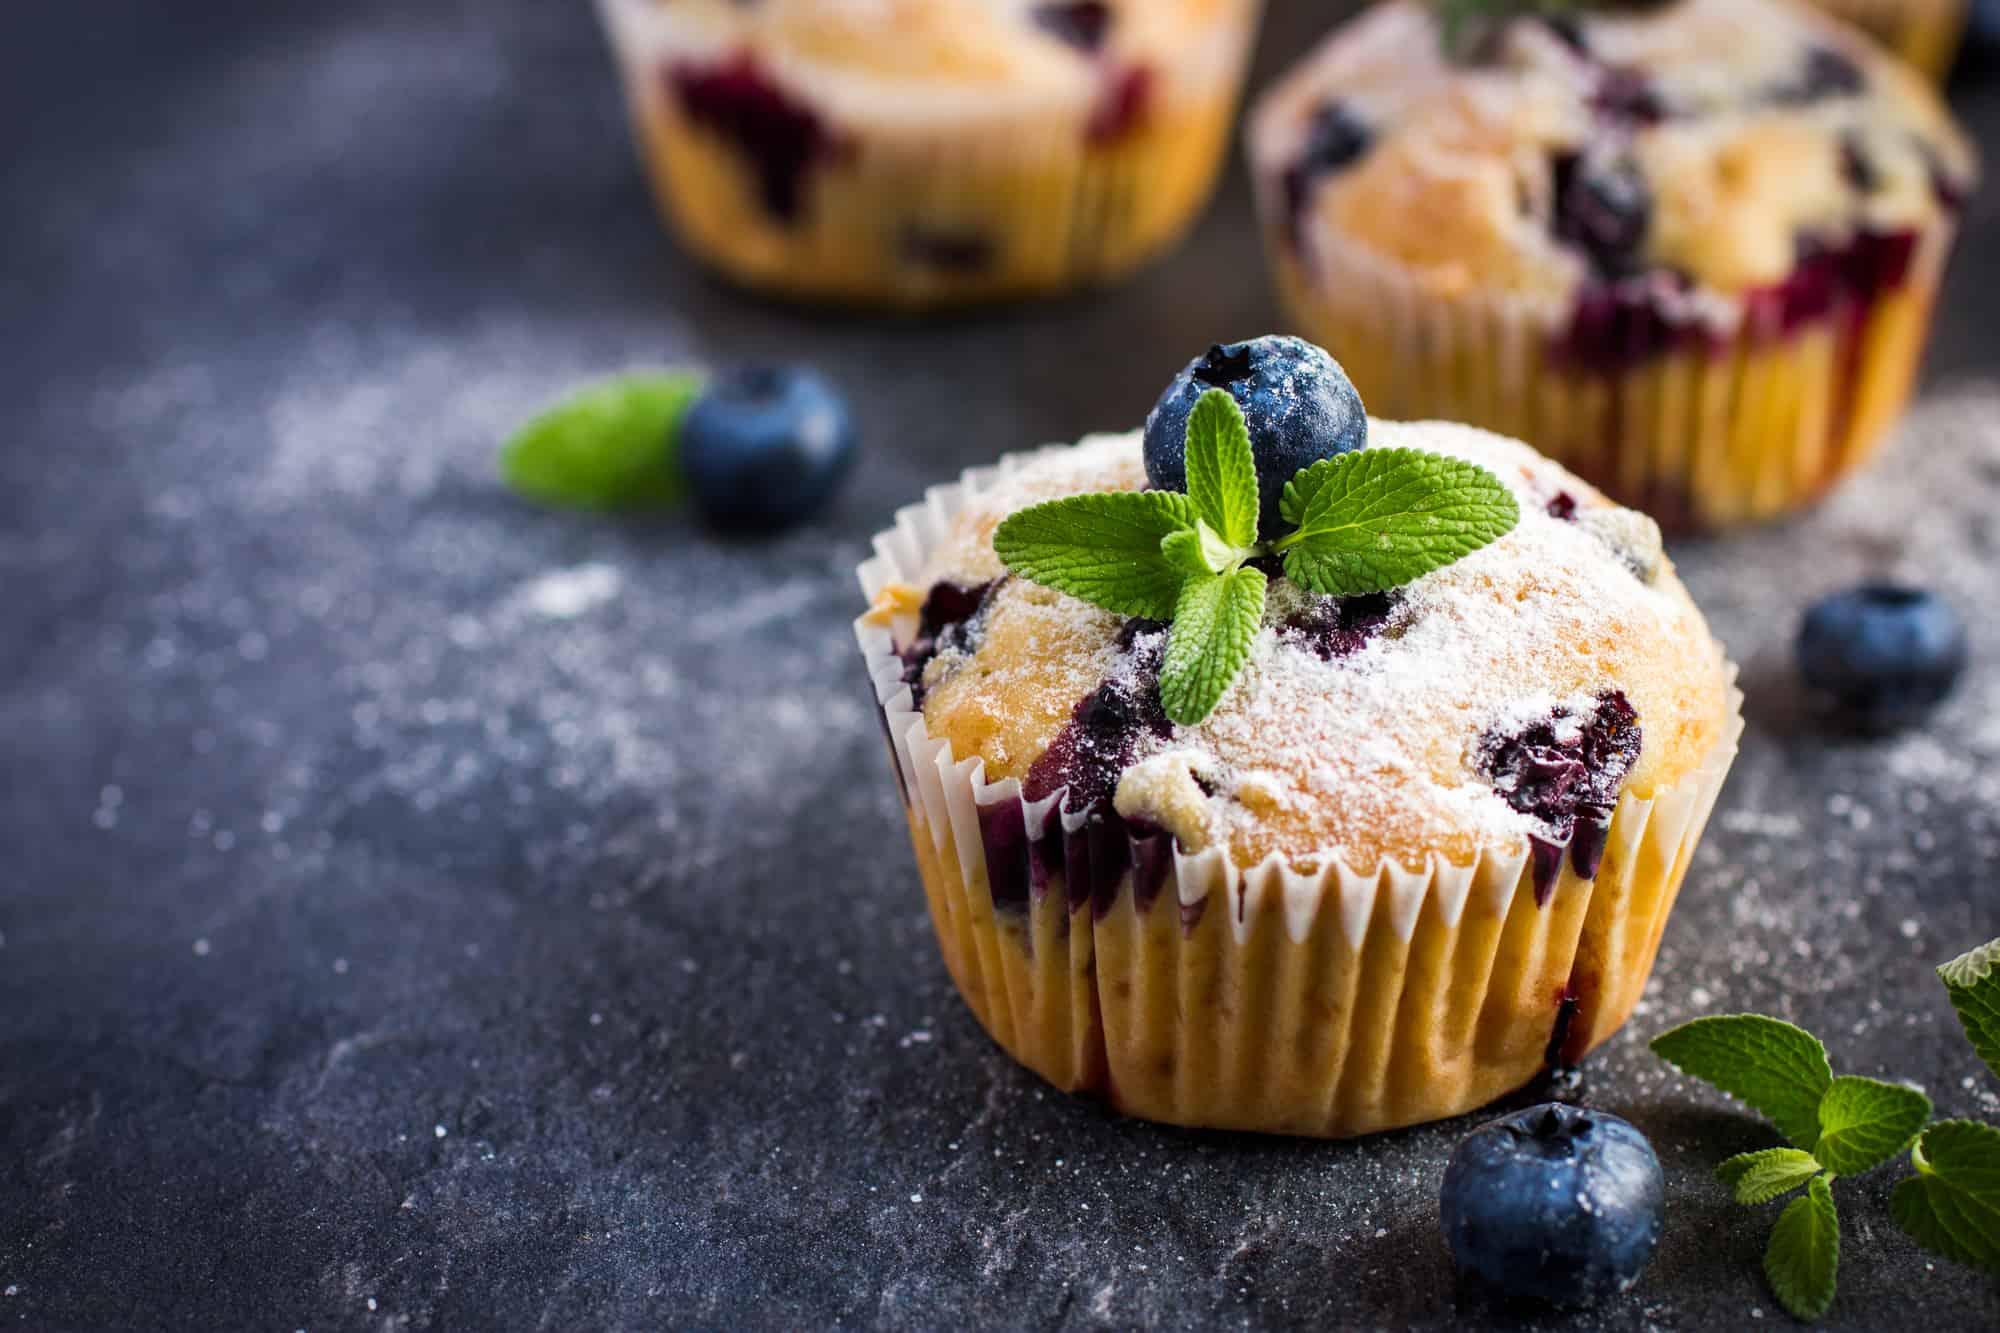 Lecker Low Carb Blaubeer Muffins aus Mandelmehl